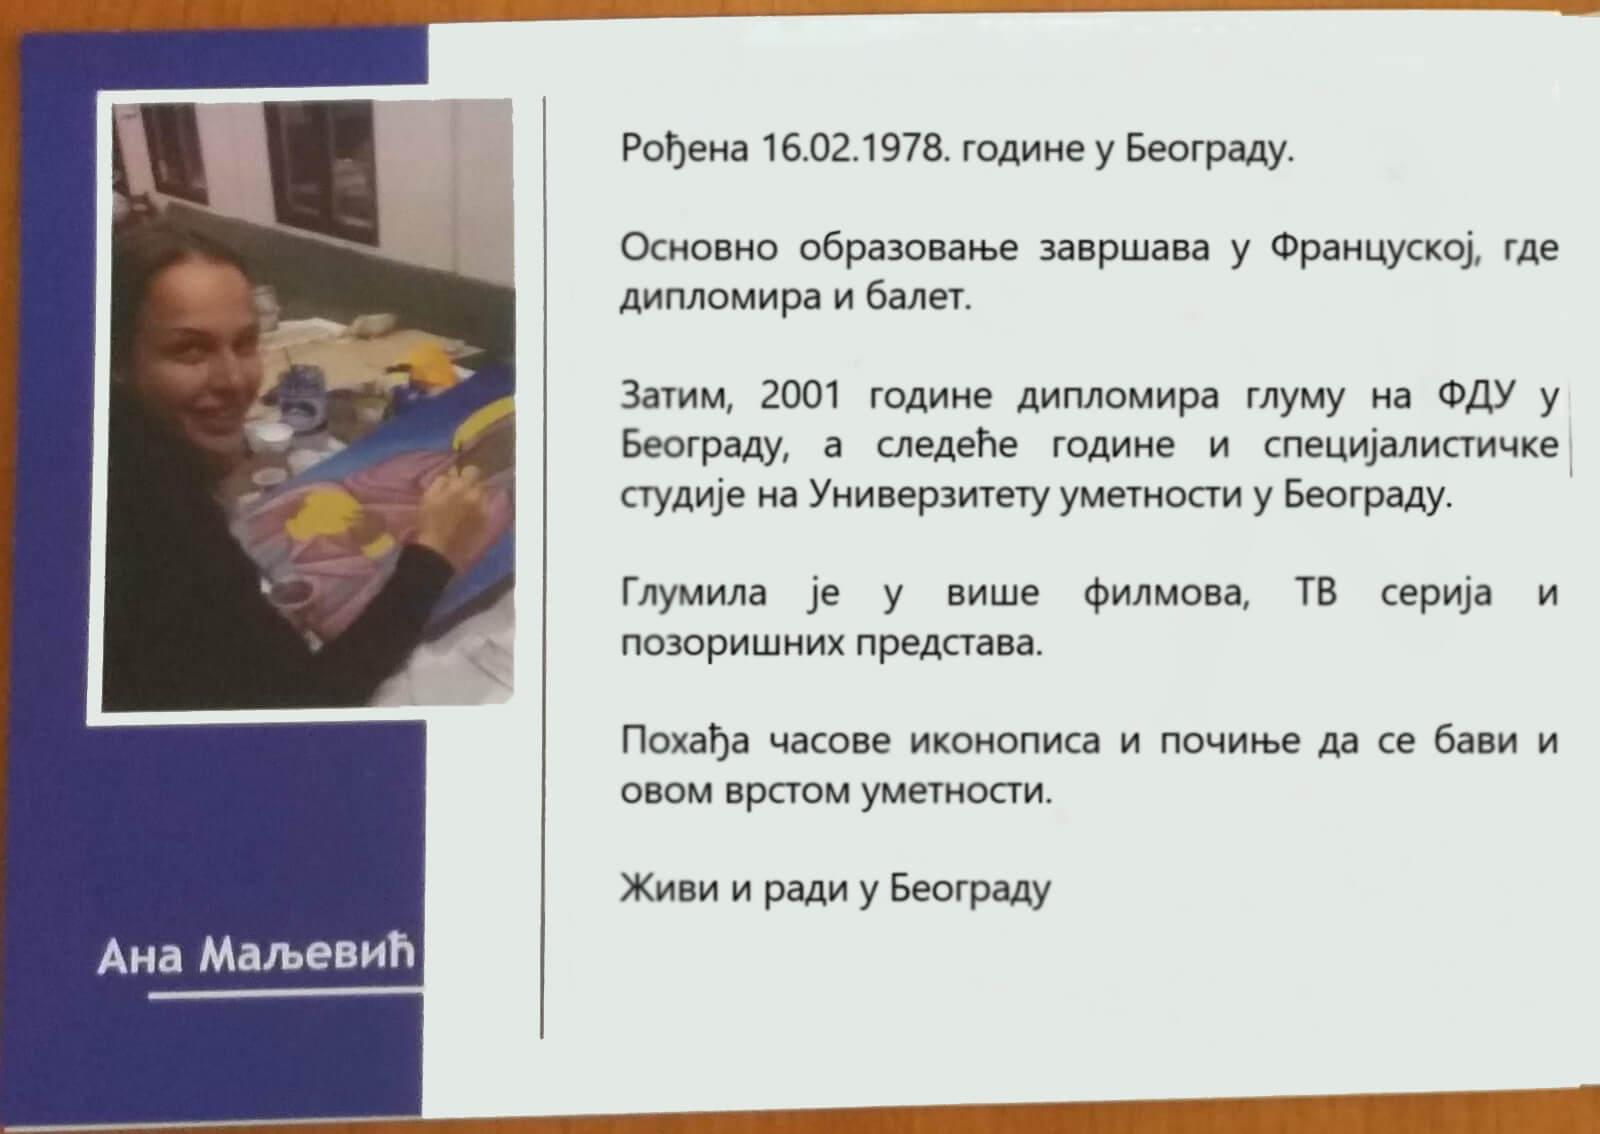 Ana Maljevic - Pravslavne ikone po narudžbini - Katalog izložbi 013